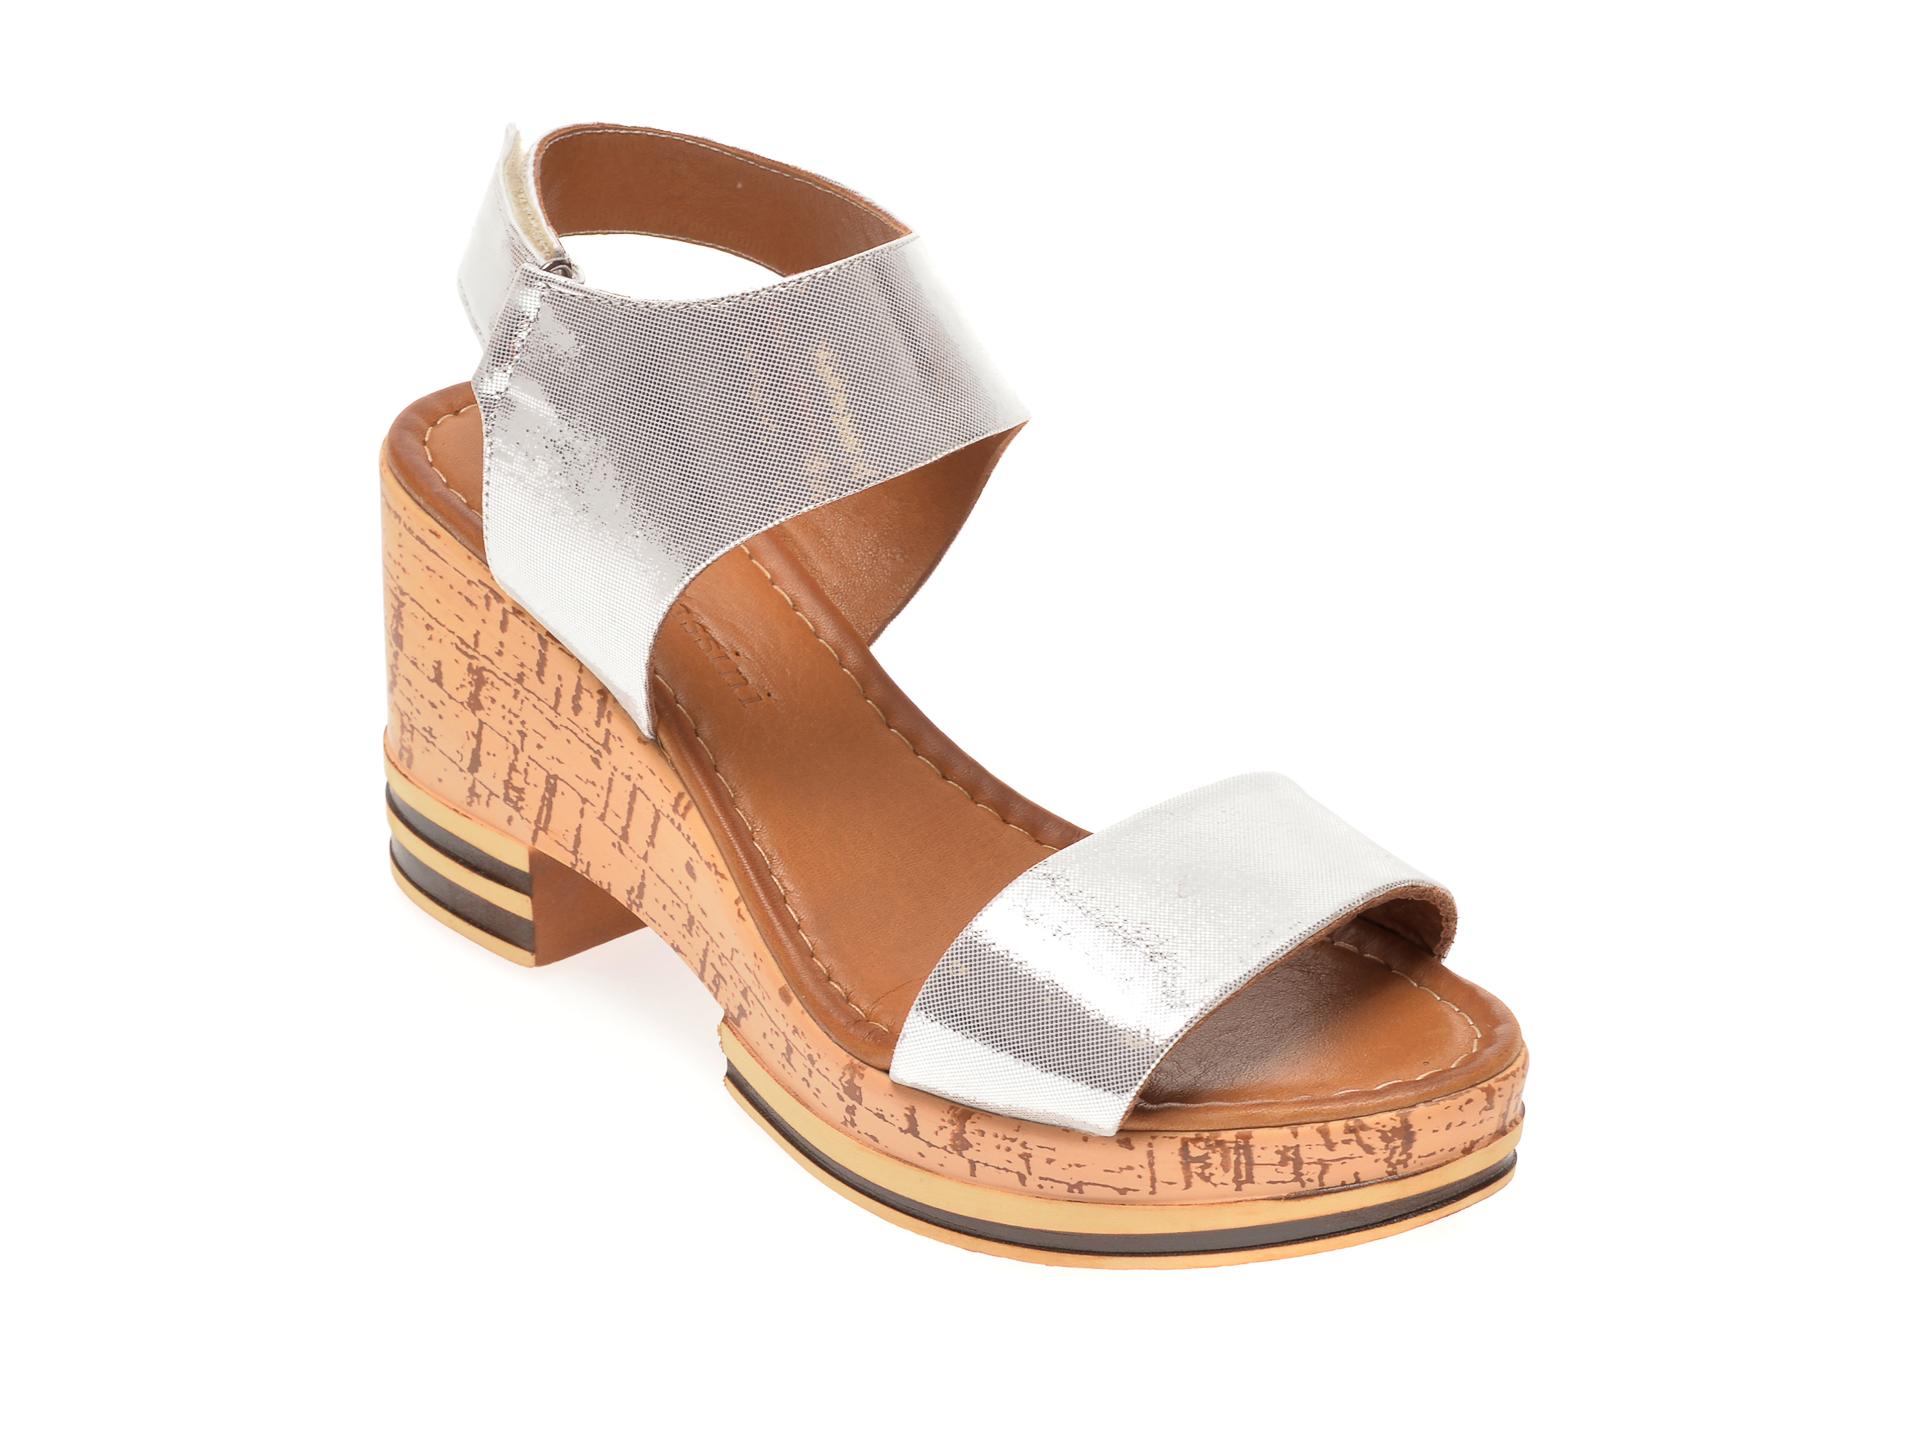 Sandale FLAVIA PASSINI argintii, 1182725, din piele naturala